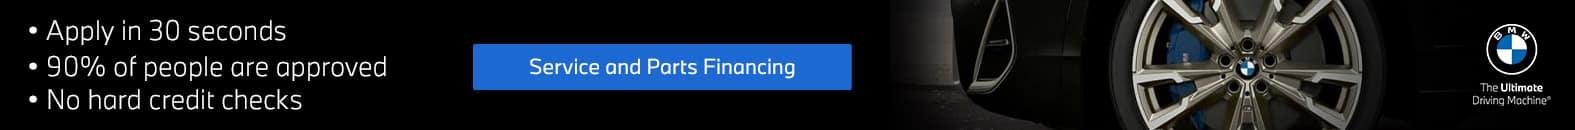 BOBMW-1575x130-ServiceFinancing